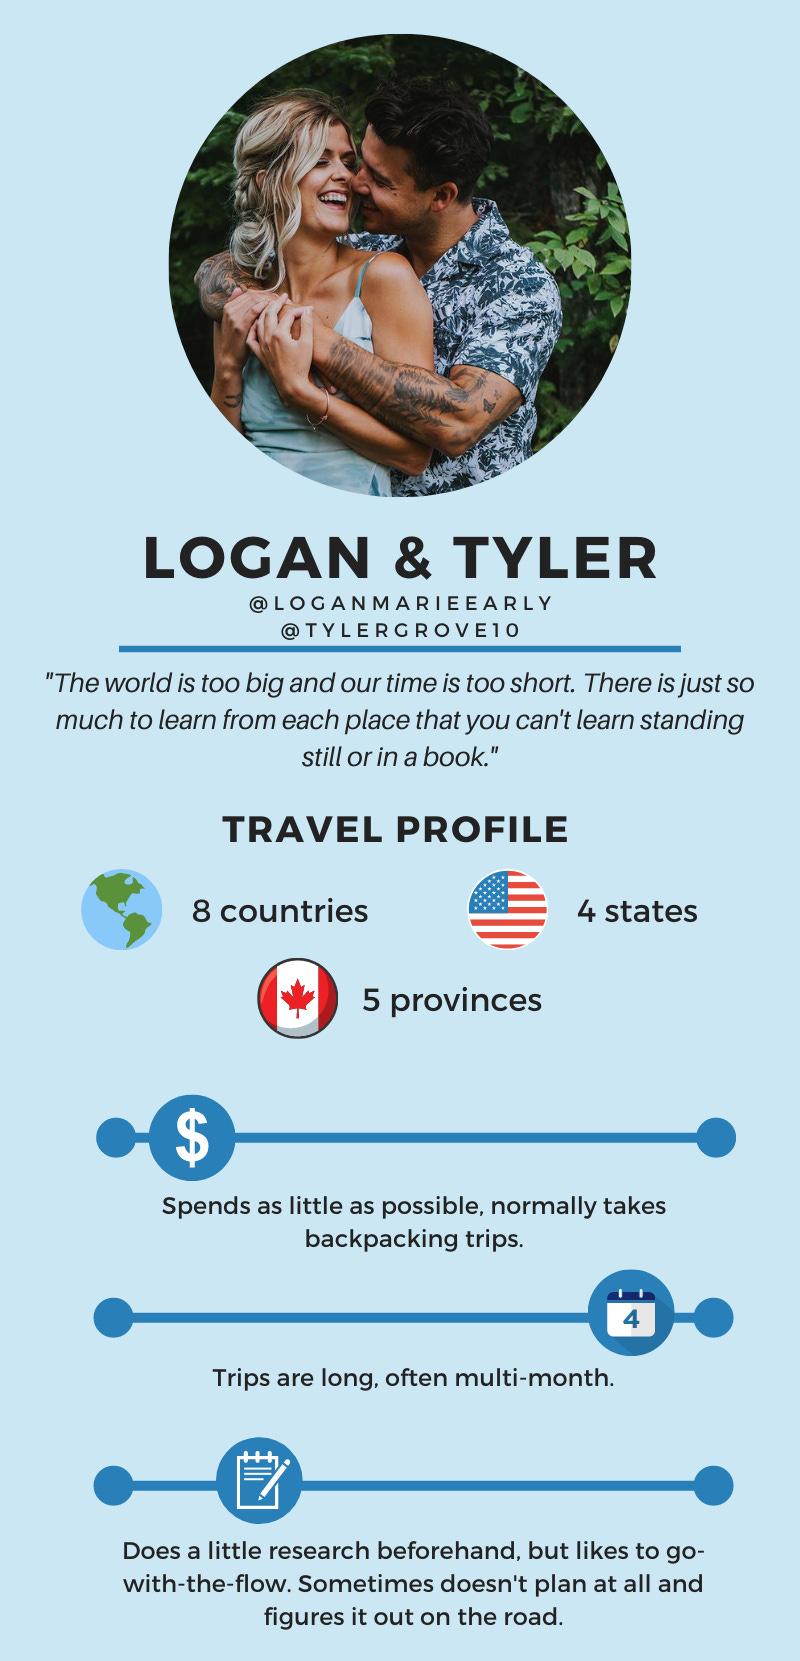 Logan and Tyler travel profile